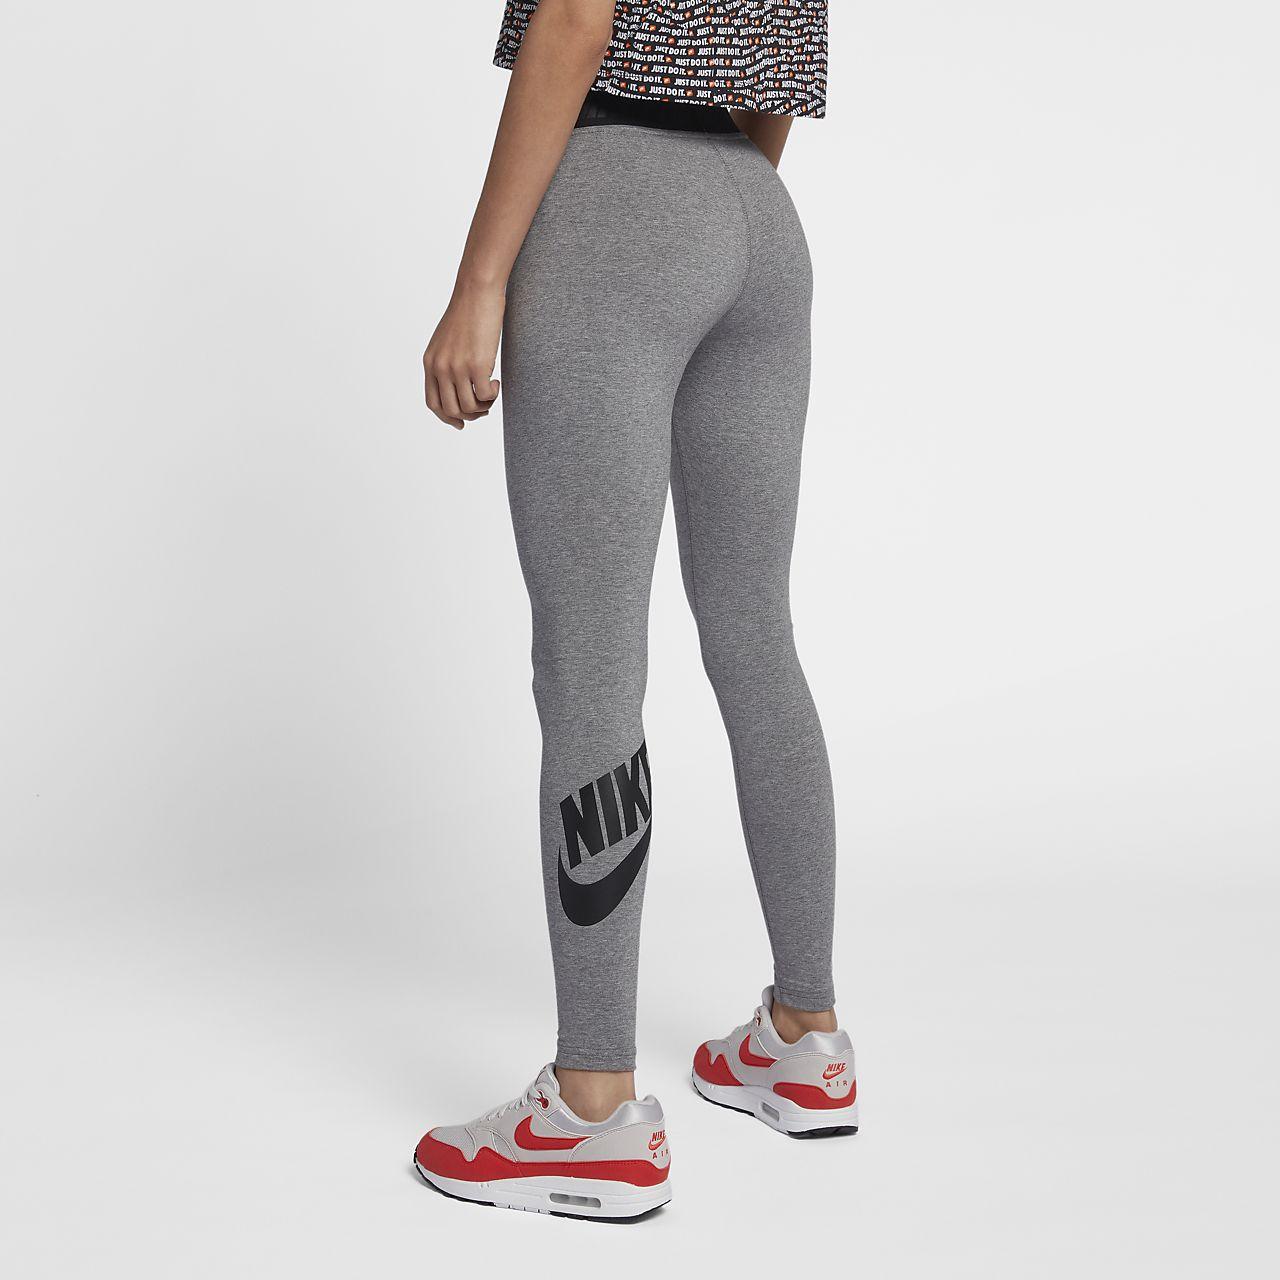 Leggings de tiro alto para mujer Nike Sportswear Leg A See